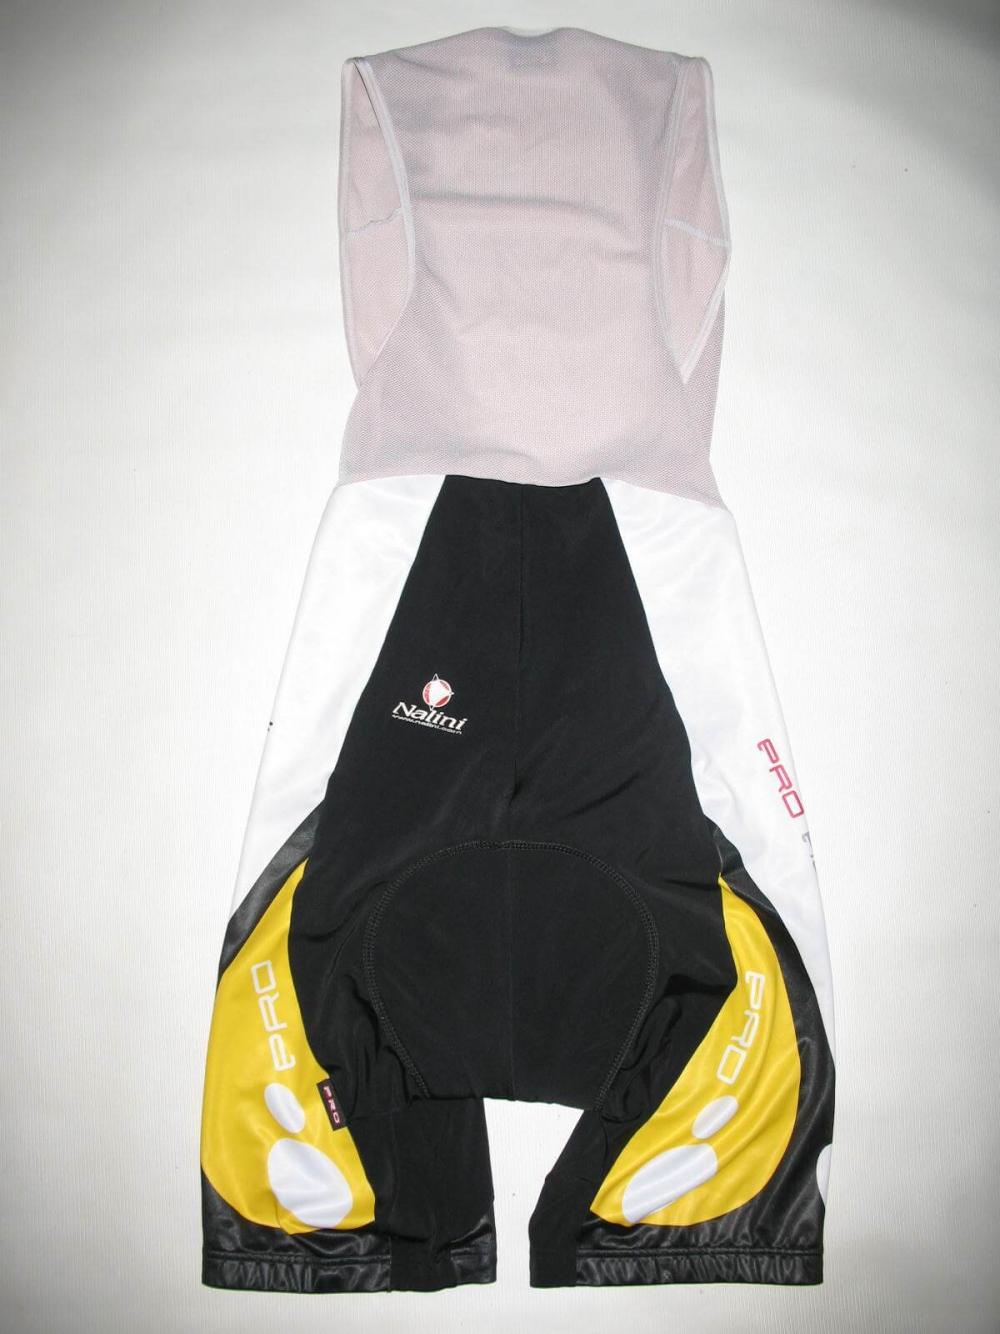 Велошорты NALINI pro active bib shorts (размер XL/L) - 2